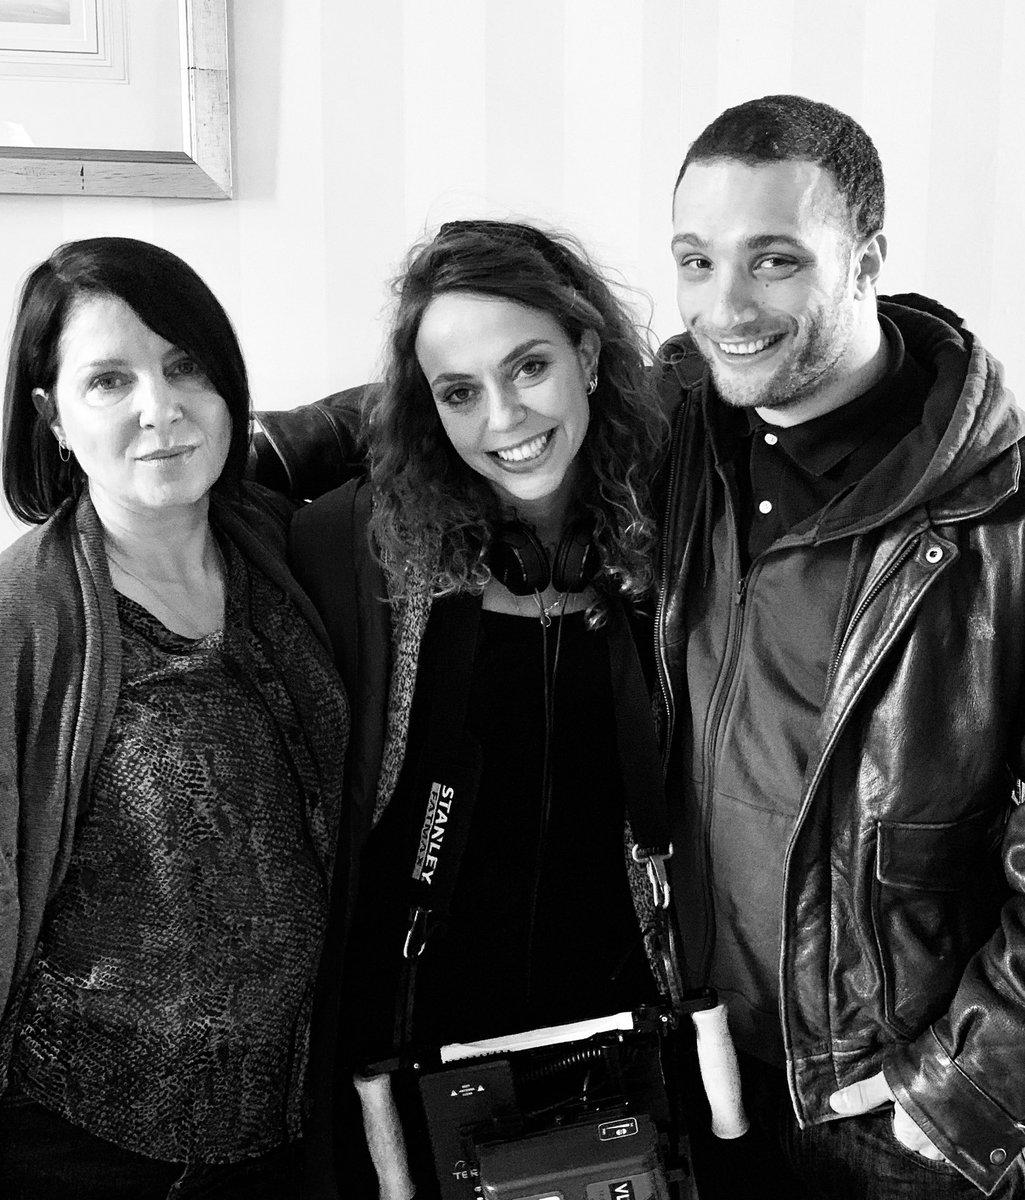 Missy Rayder,Rayveness Porno clips Brighton Sharbino,Jennifer Love Hewitt born February 21, 1979 (age 39)